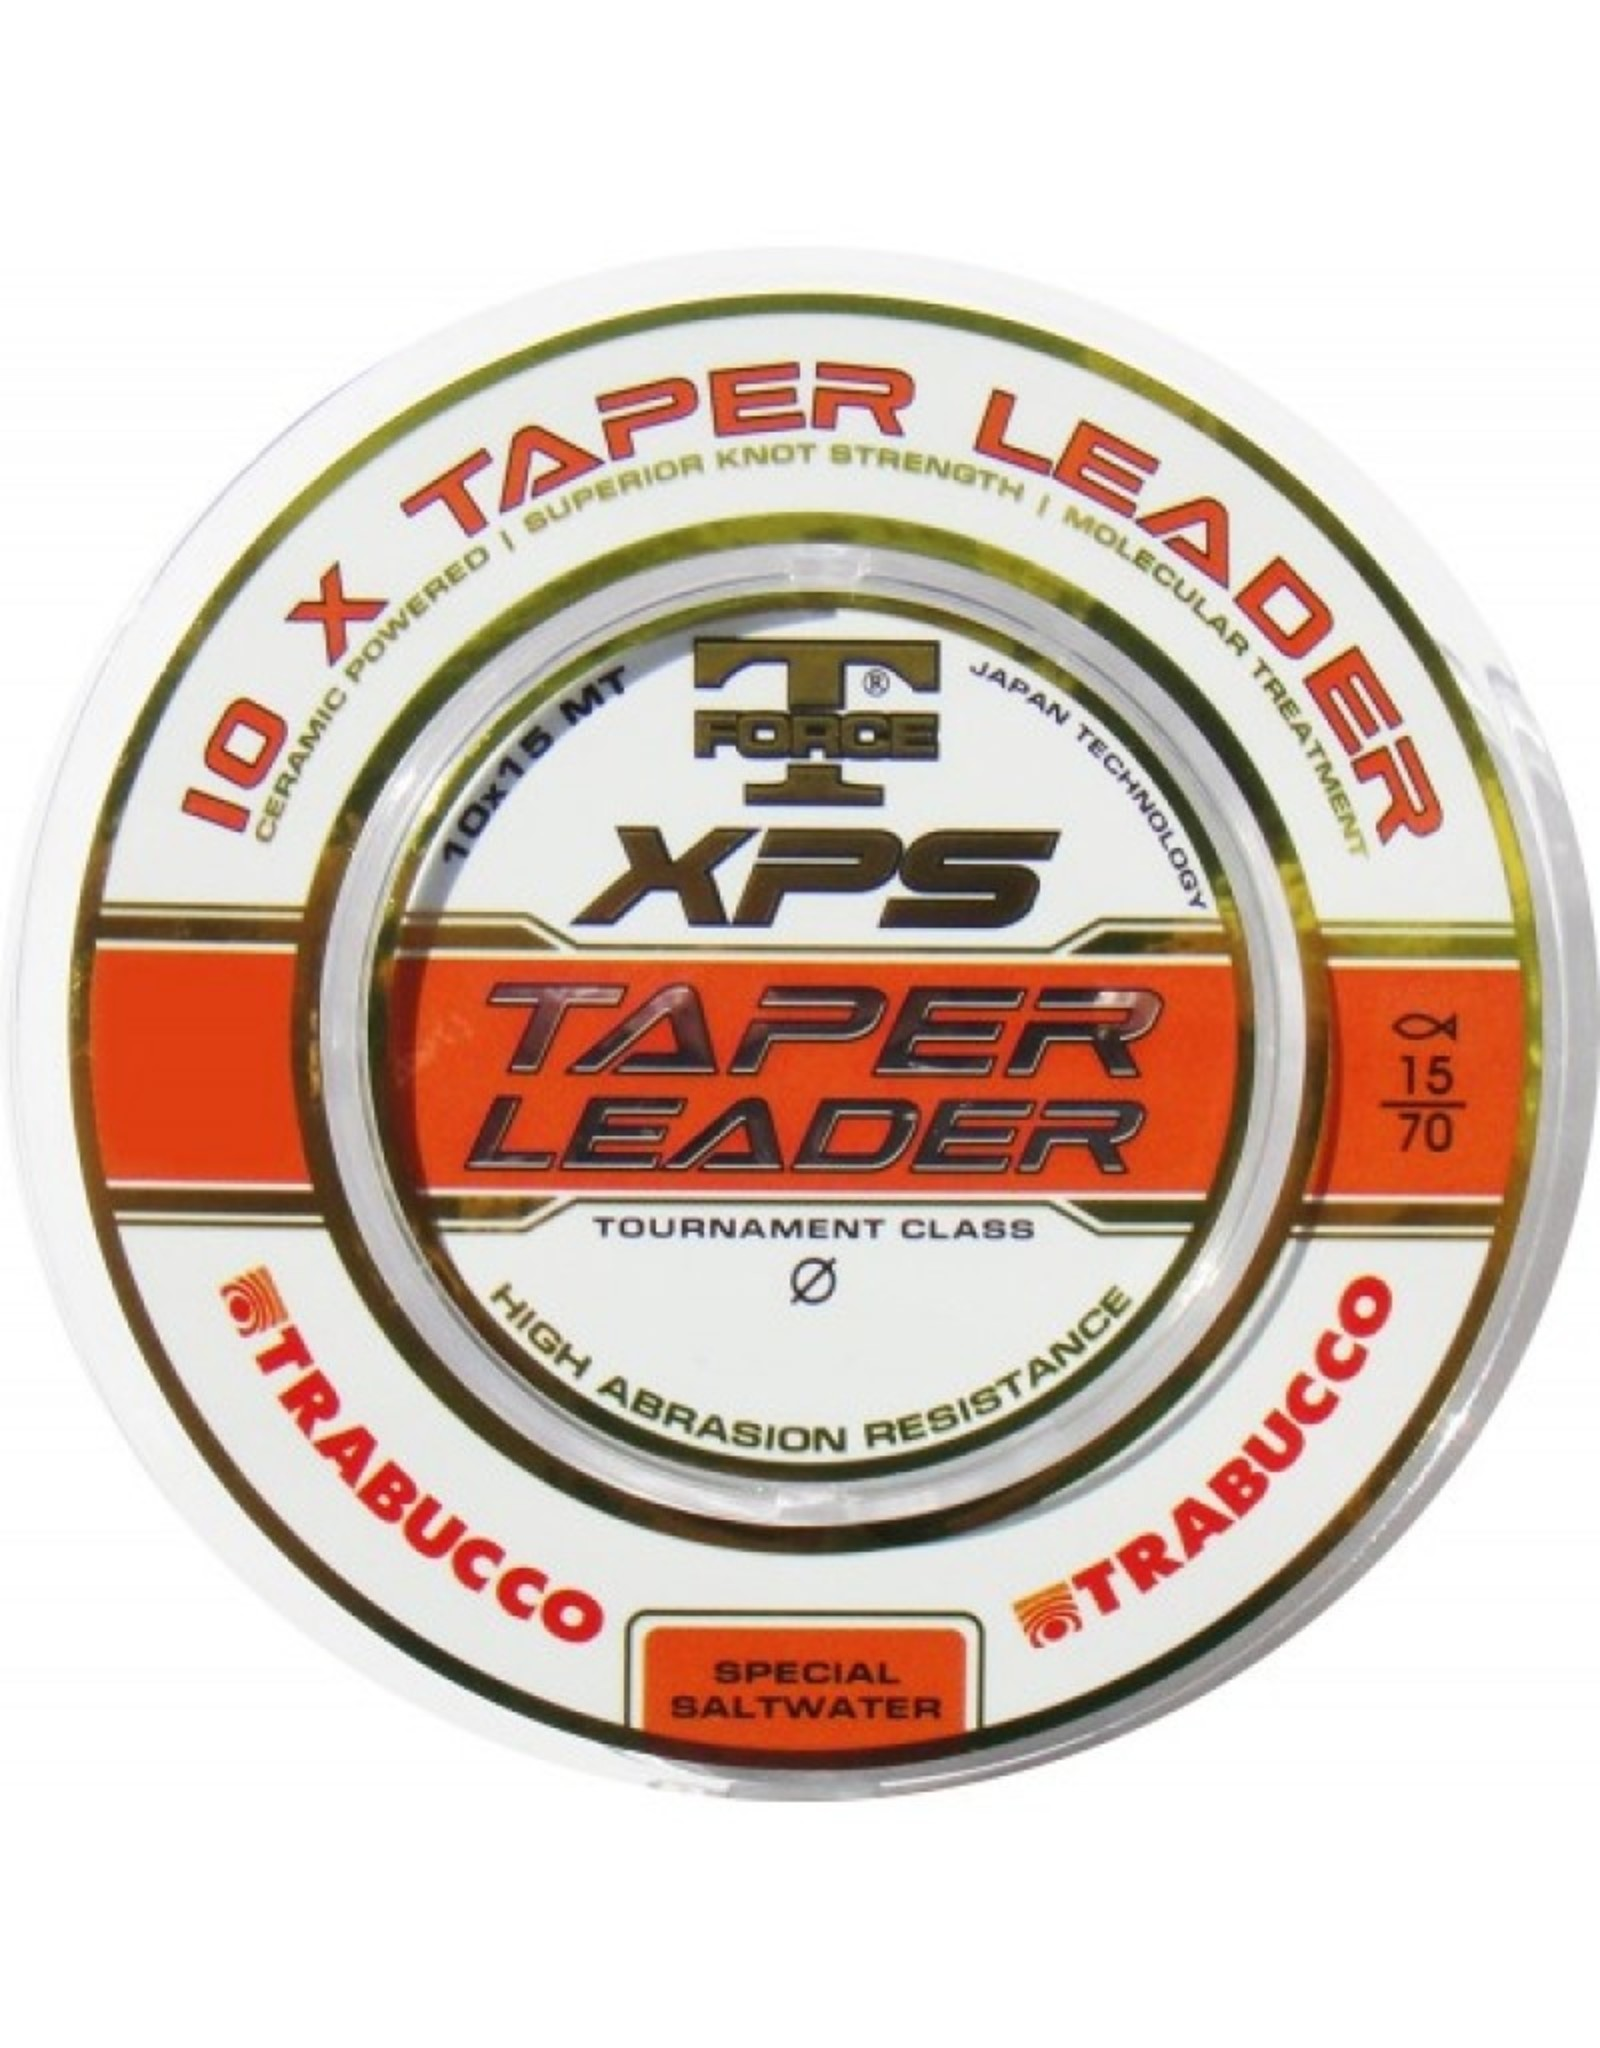 Trabucco Trabucco XPS Tapered Leader 15-70LB x10